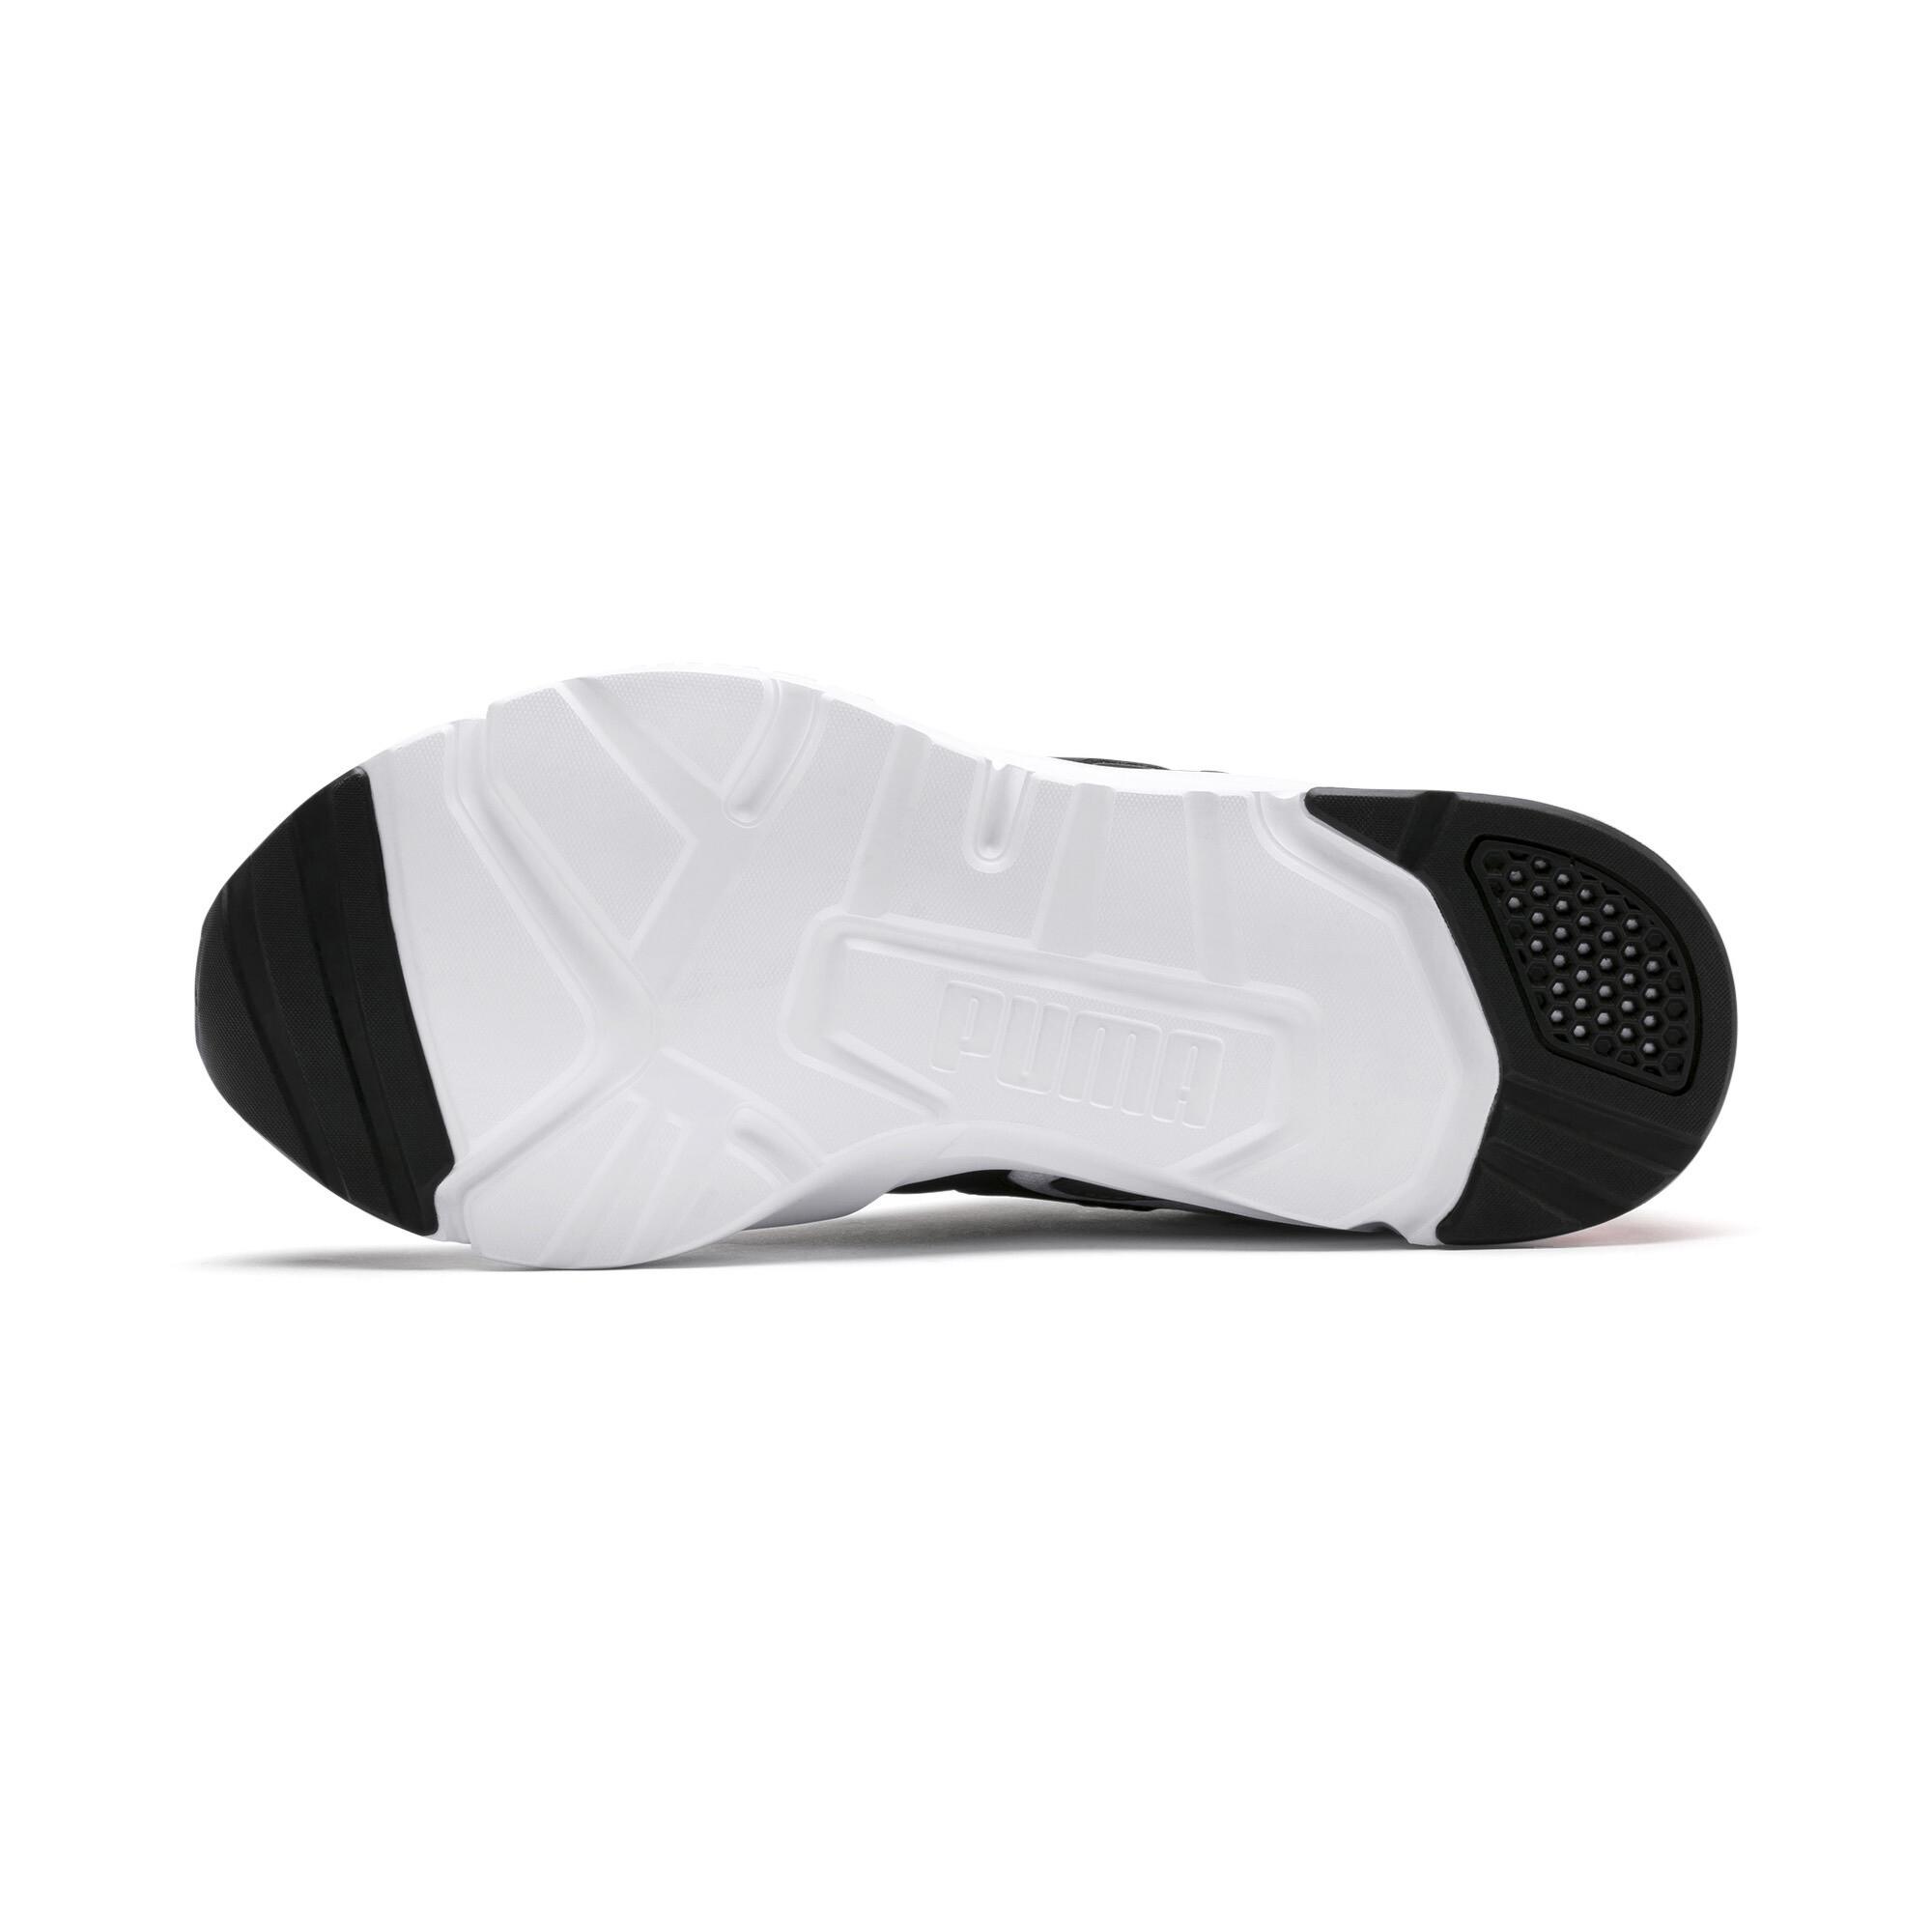 PUMA-Men-039-s-CELL-Pharos-Training-Shoes thumbnail 5